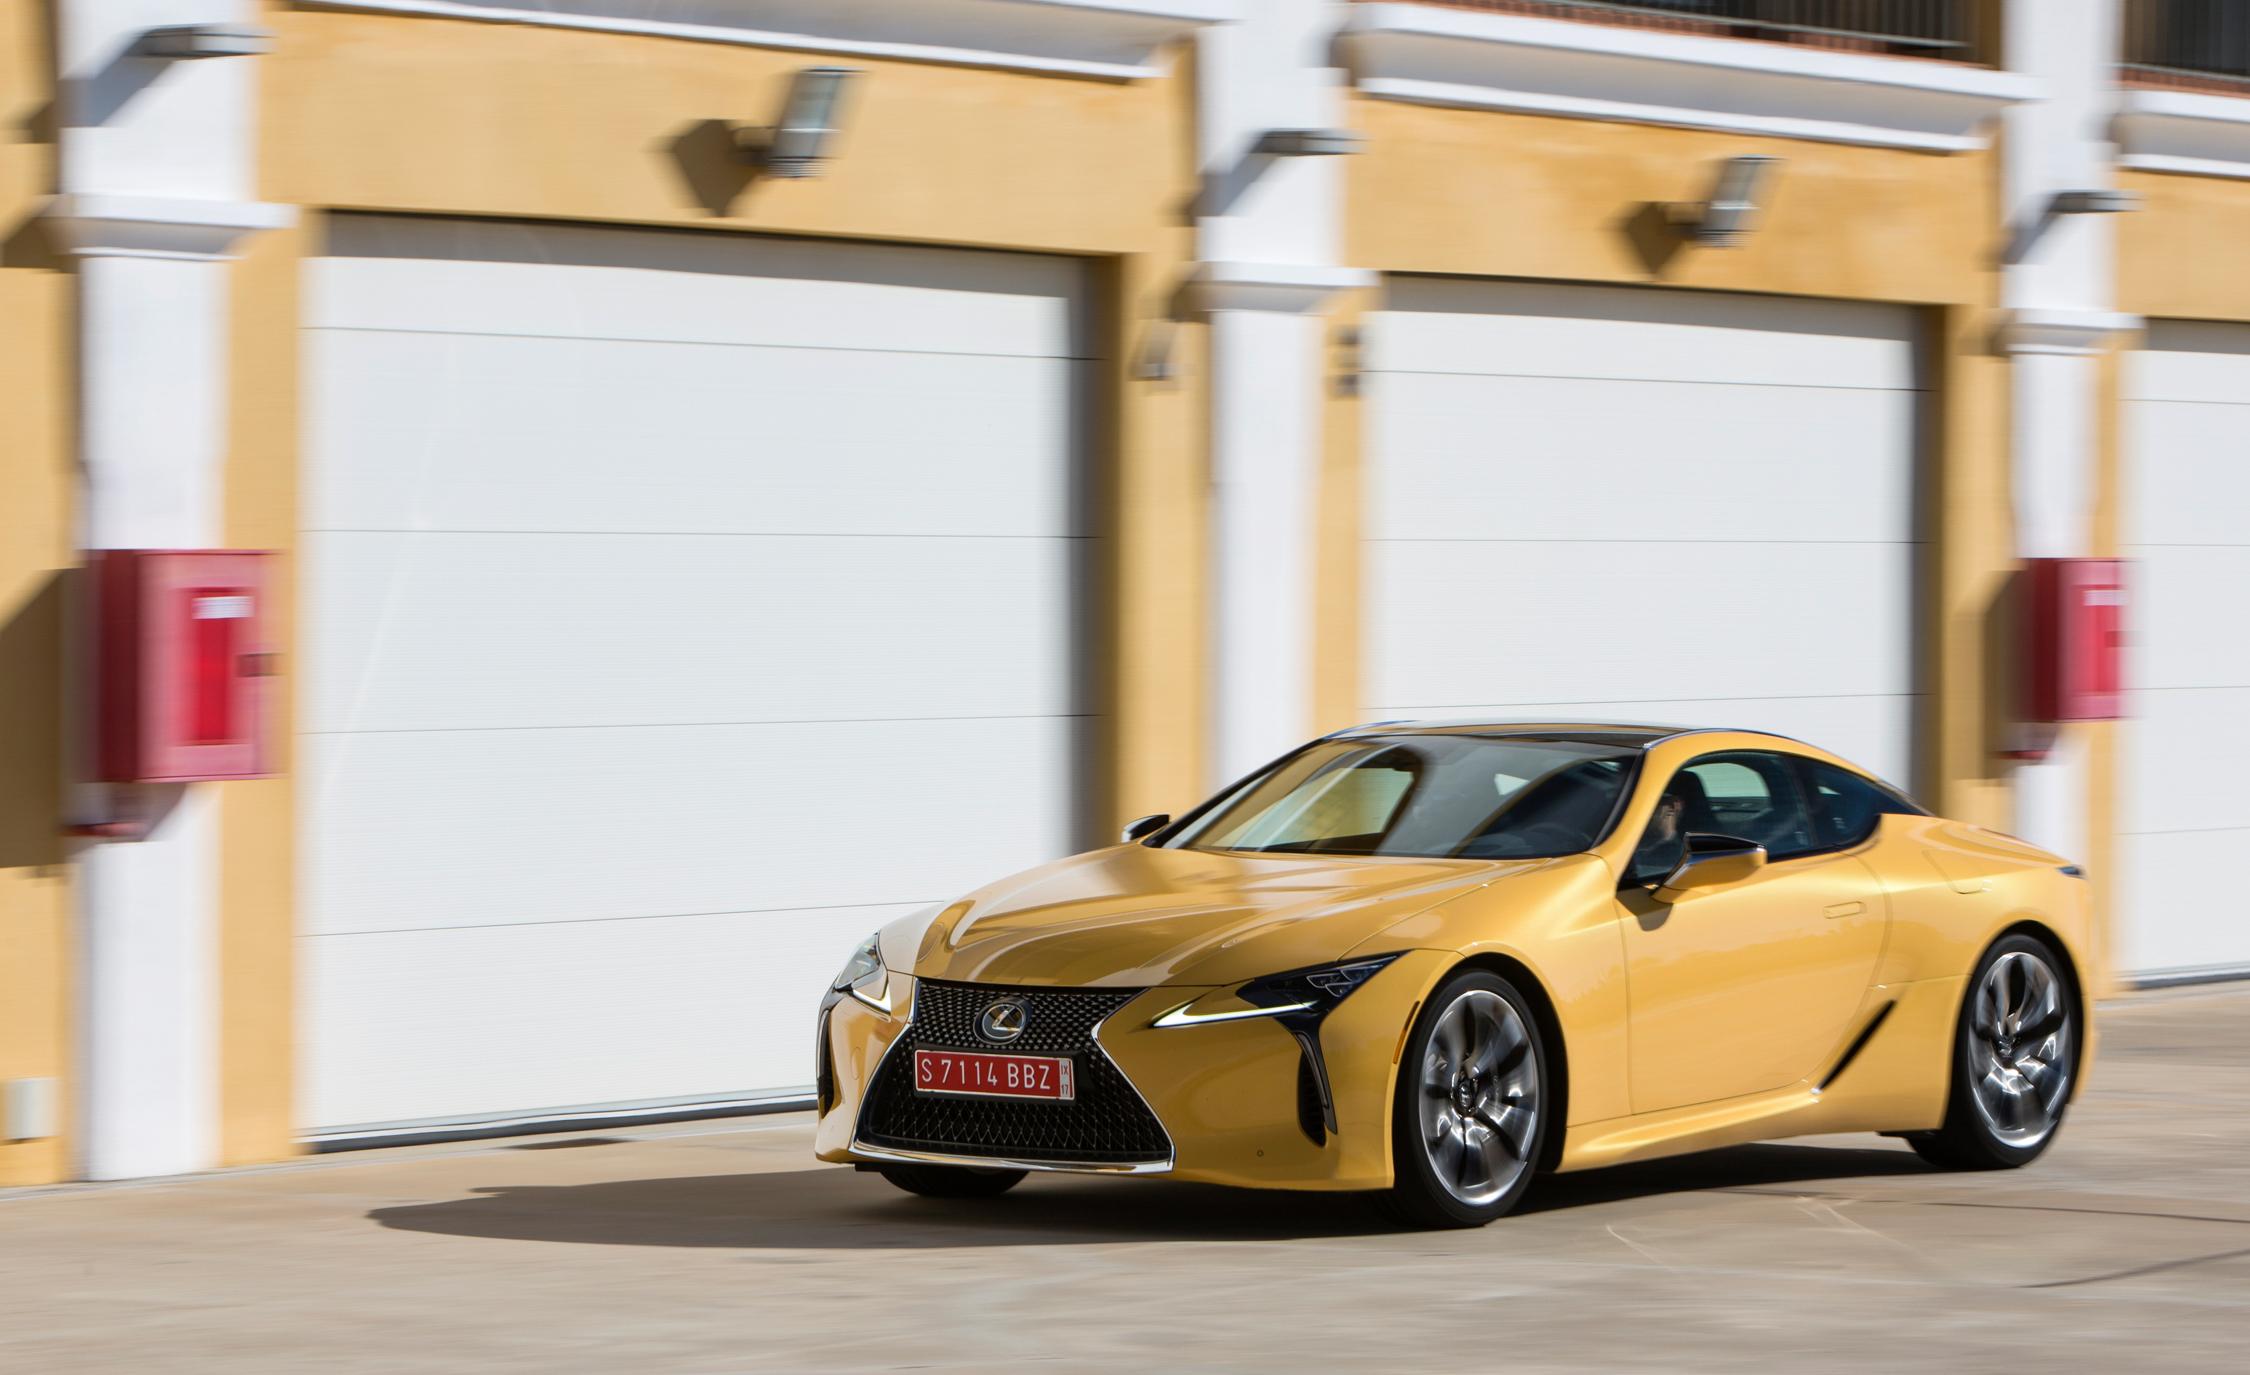 2018 Lexus Lc 500 Yellow Test Drive (Photo 29 of 84)